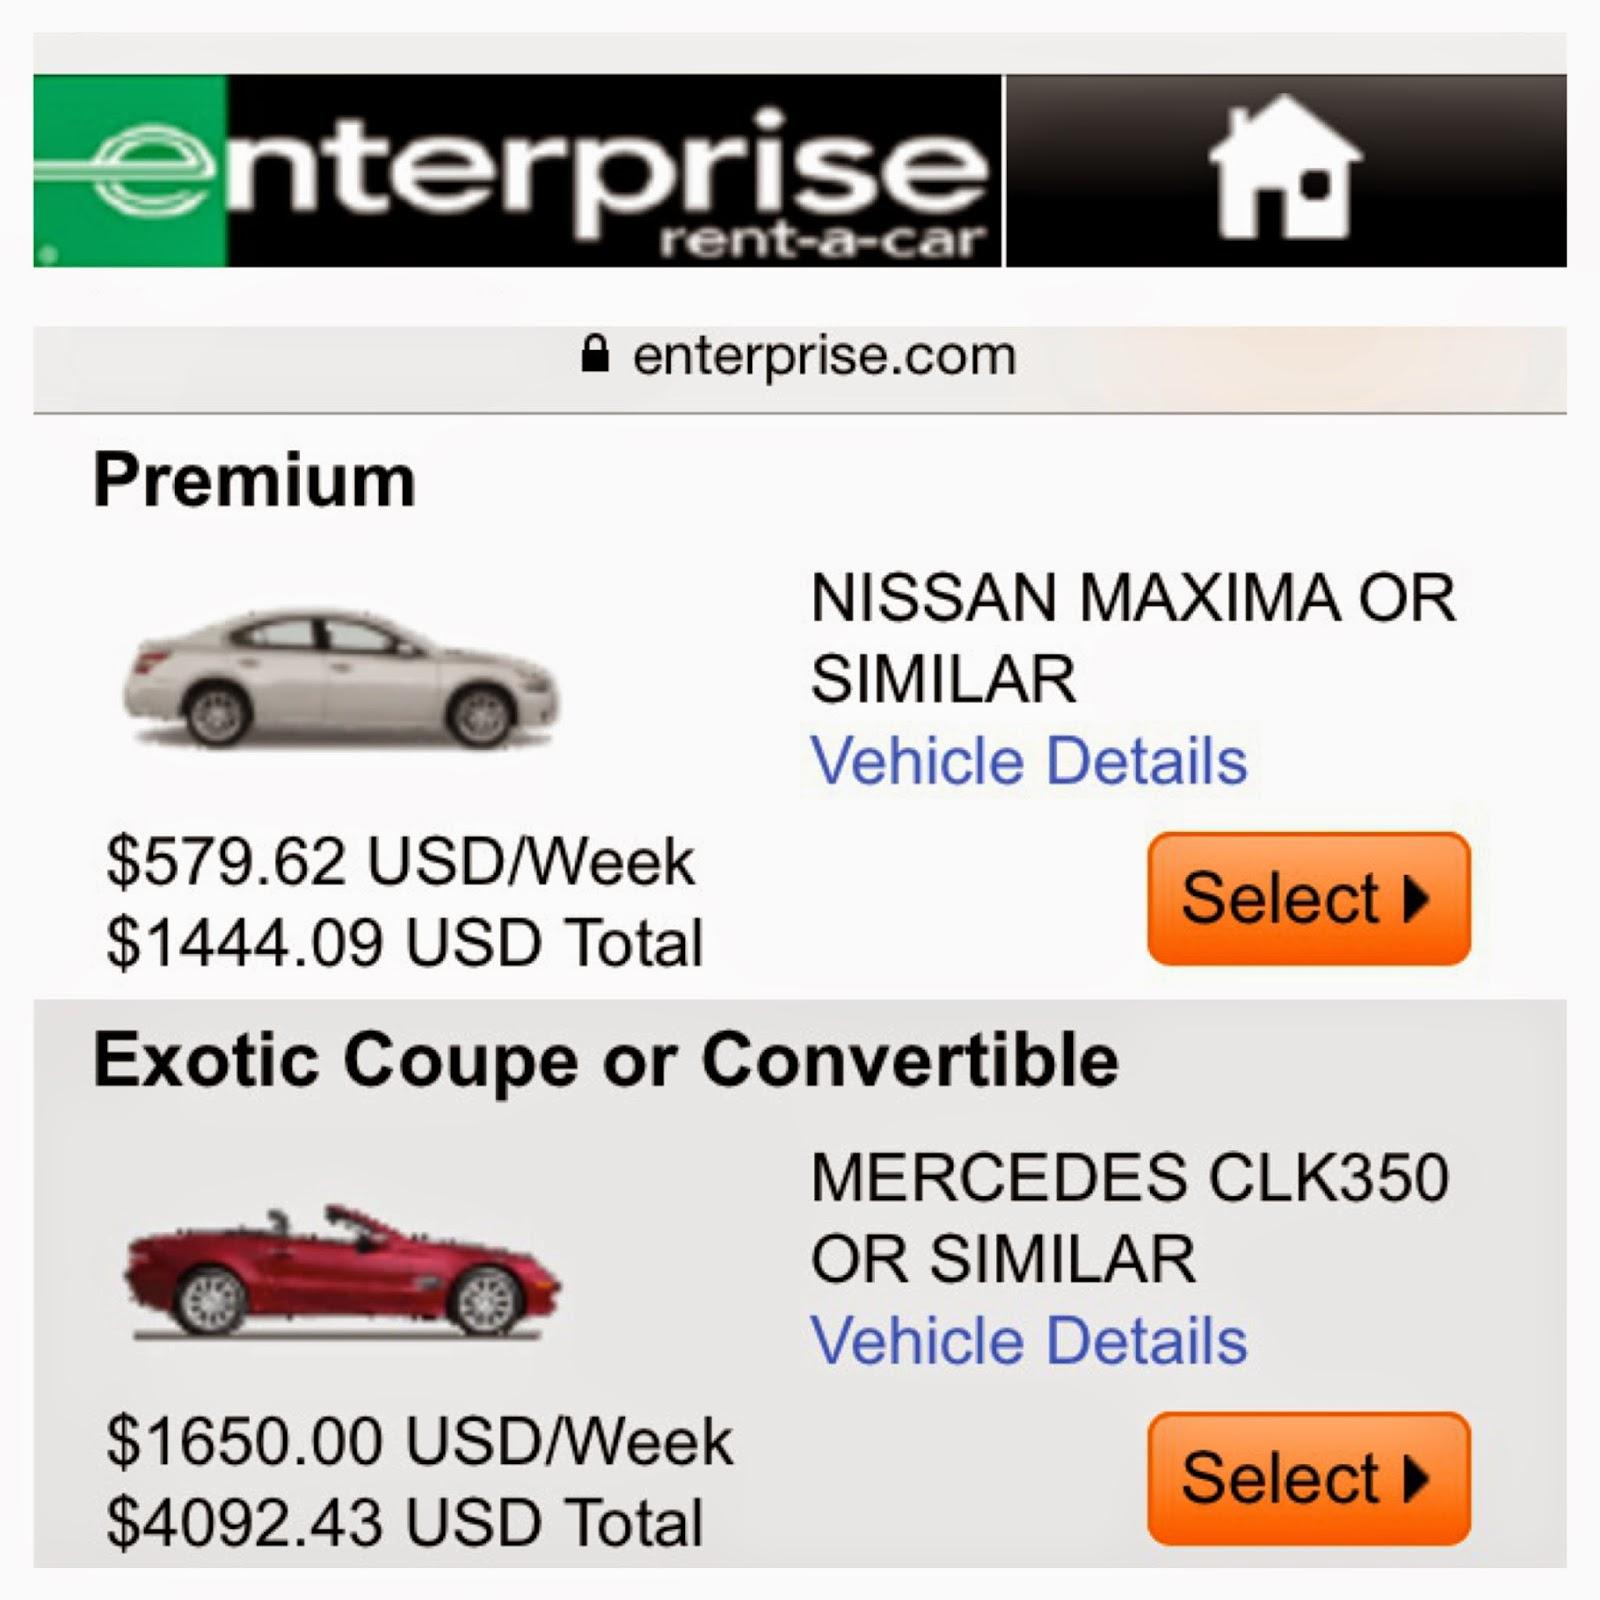 Book Your Next Rental Car Through Costco Travel!